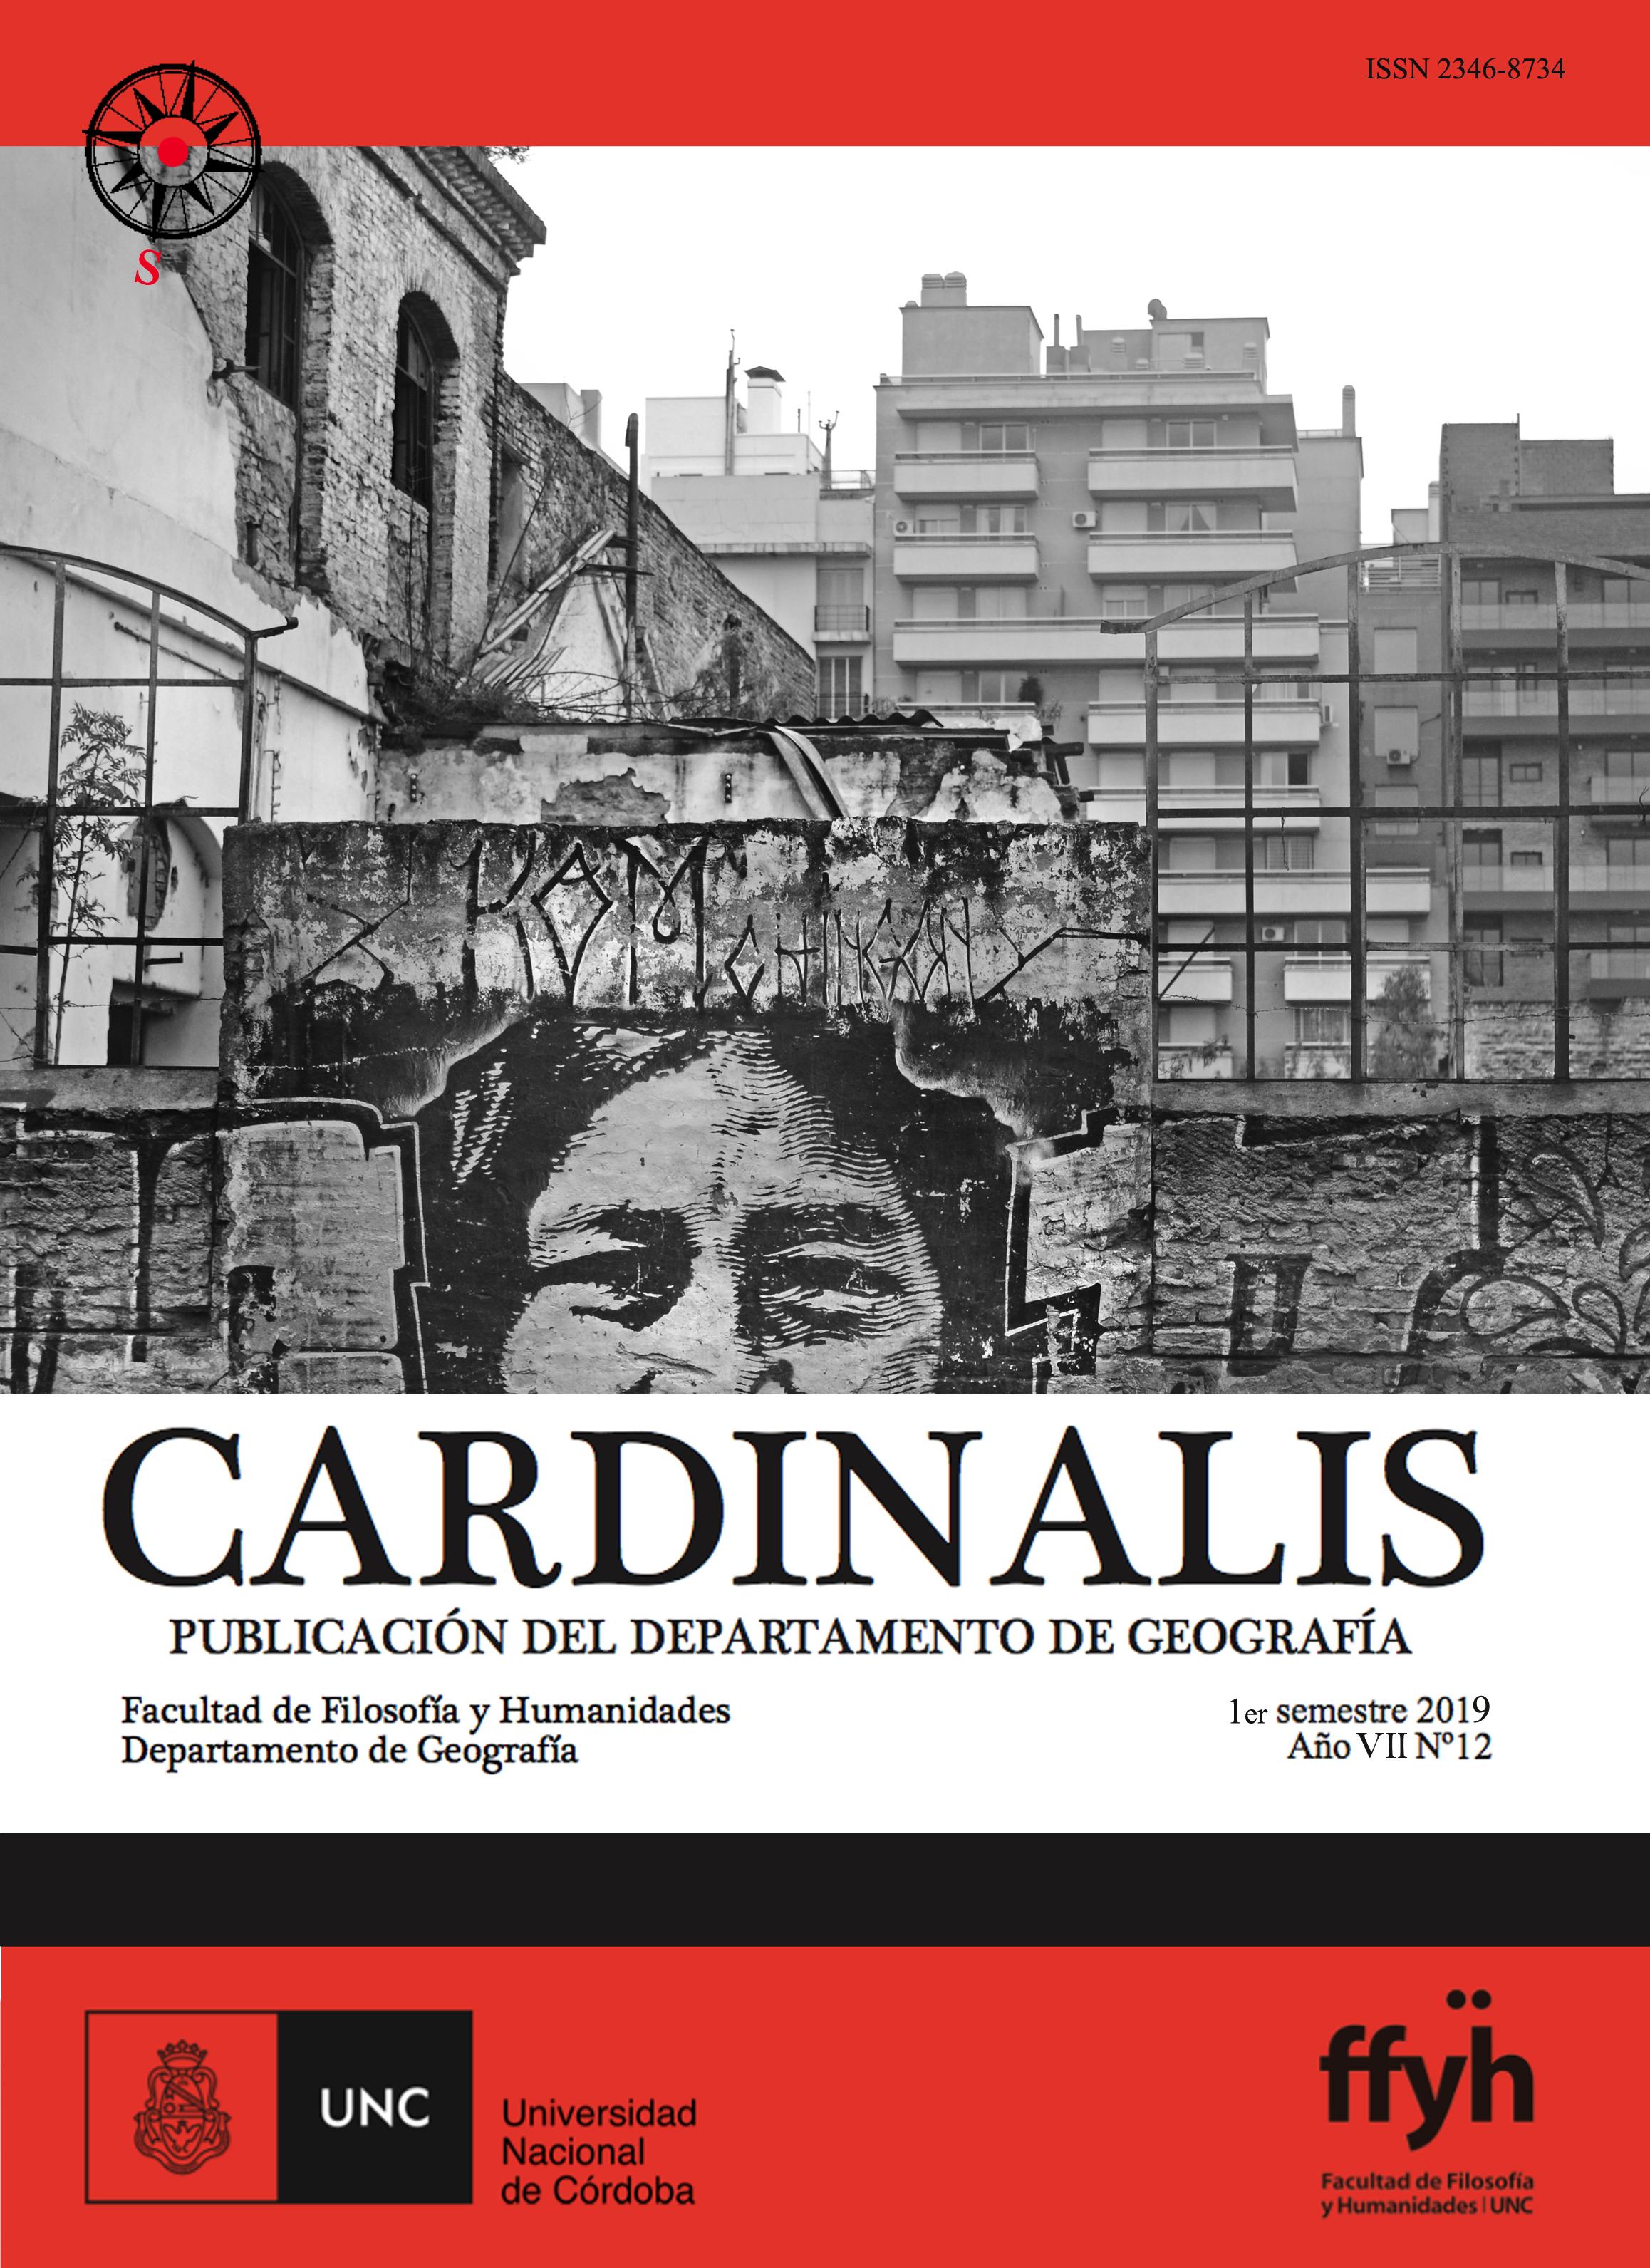 Diseño de tapa e imagen: Vicente Girardi Callafa. Técnica: collage digital